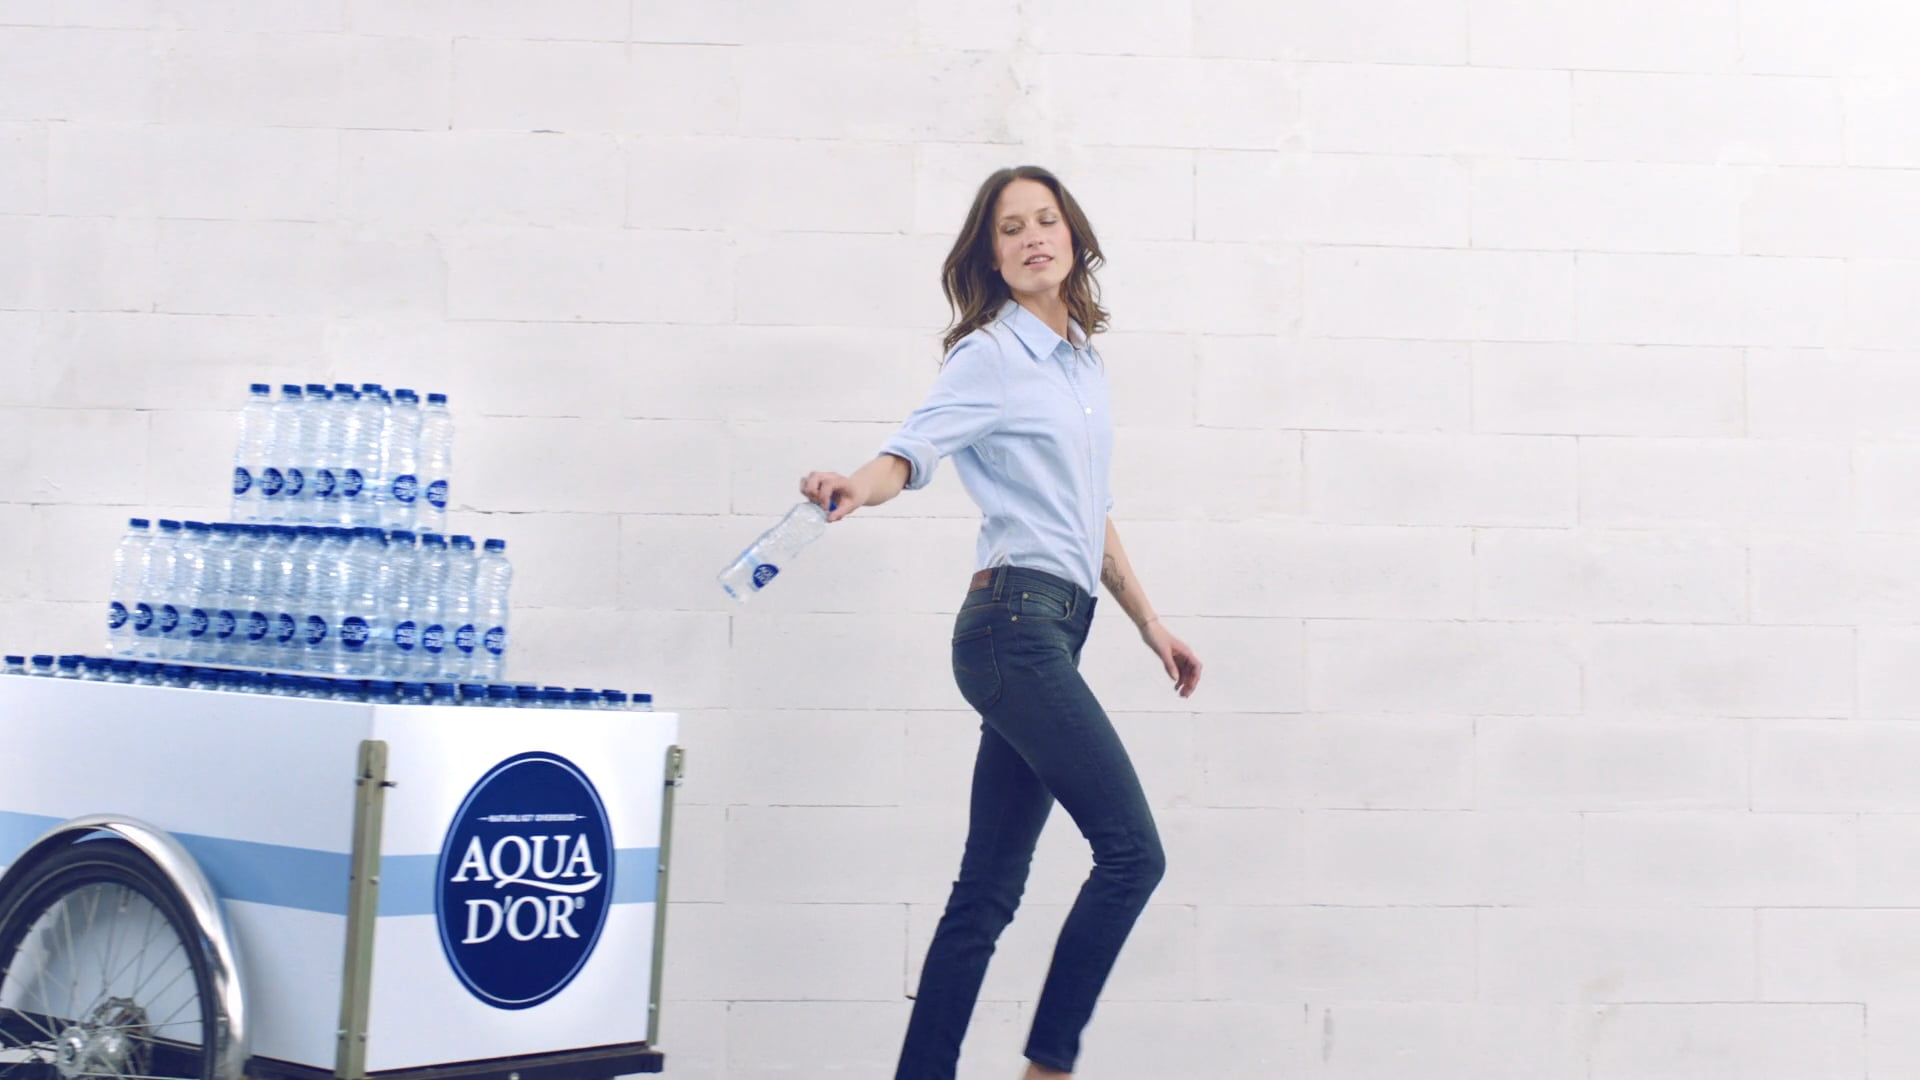 Aqua D'or - Naturlig Overskud